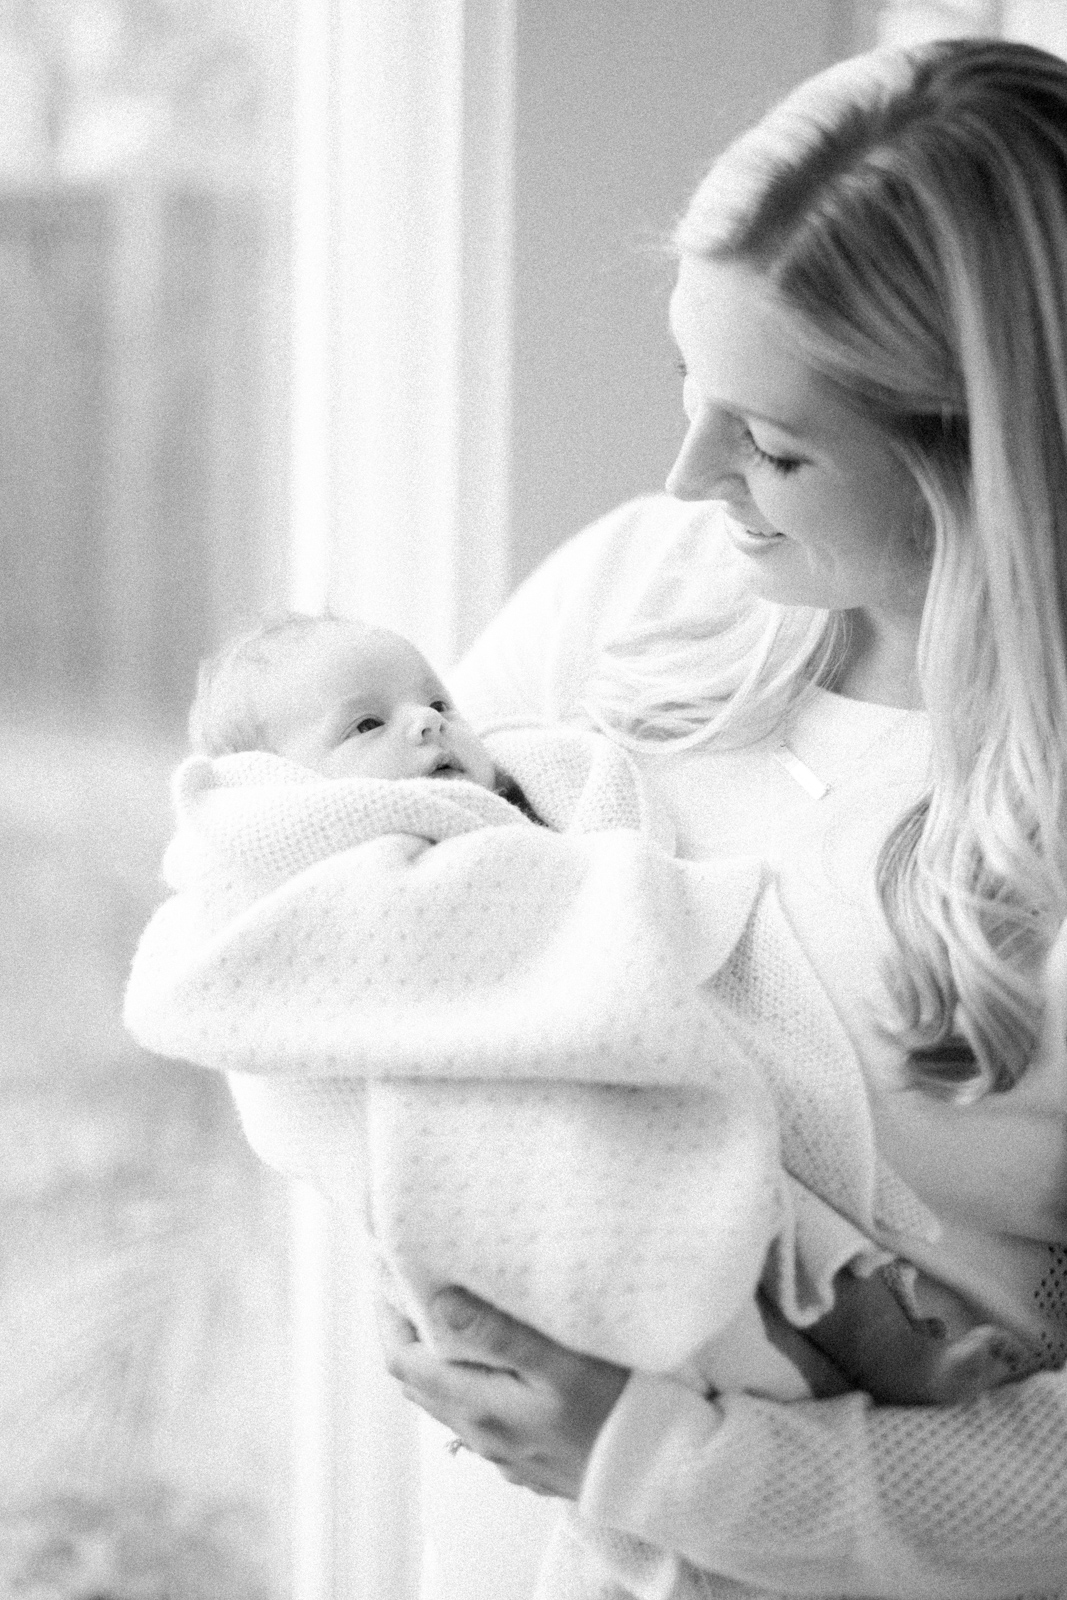 san-diego-newborn-photographer-2.jpg